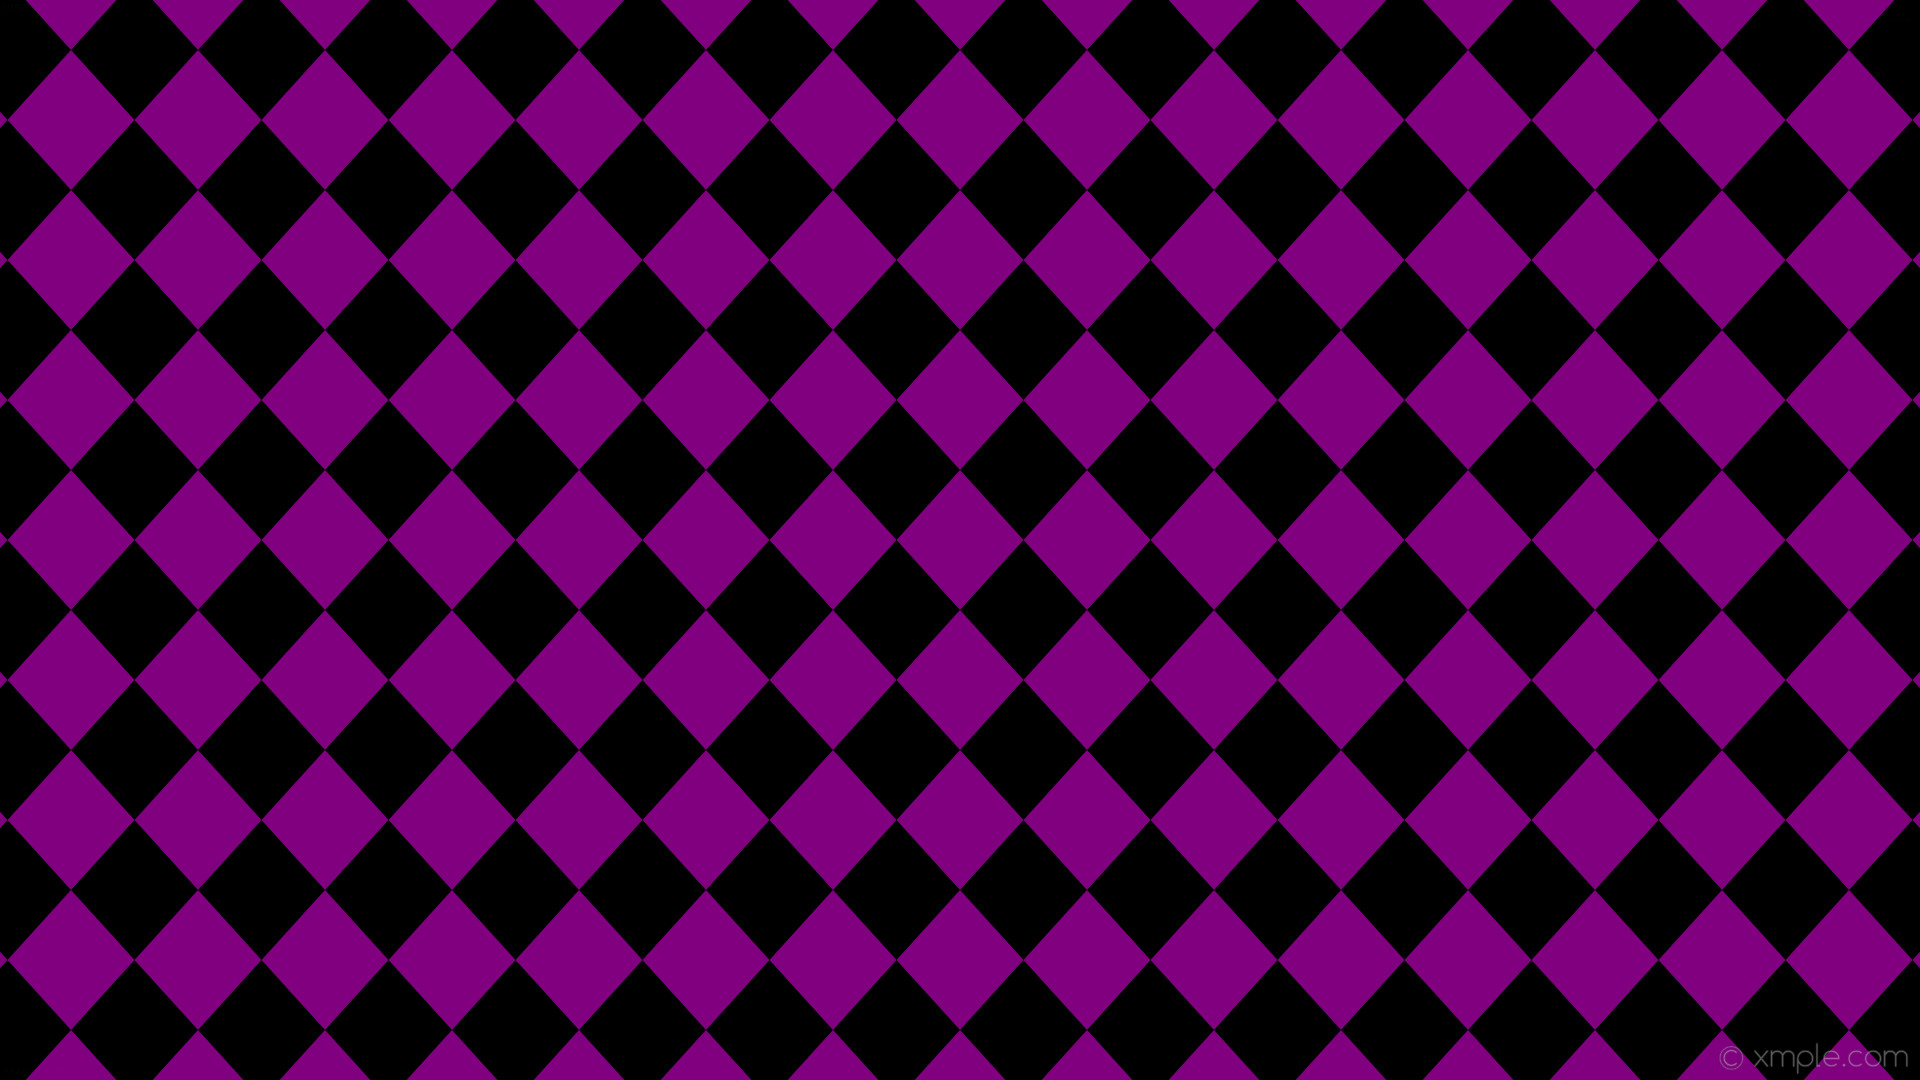 Res: 1920x1080, Wallpaper rhombus purple black diamond lozenge #800080 #000000 90° 140px  127px